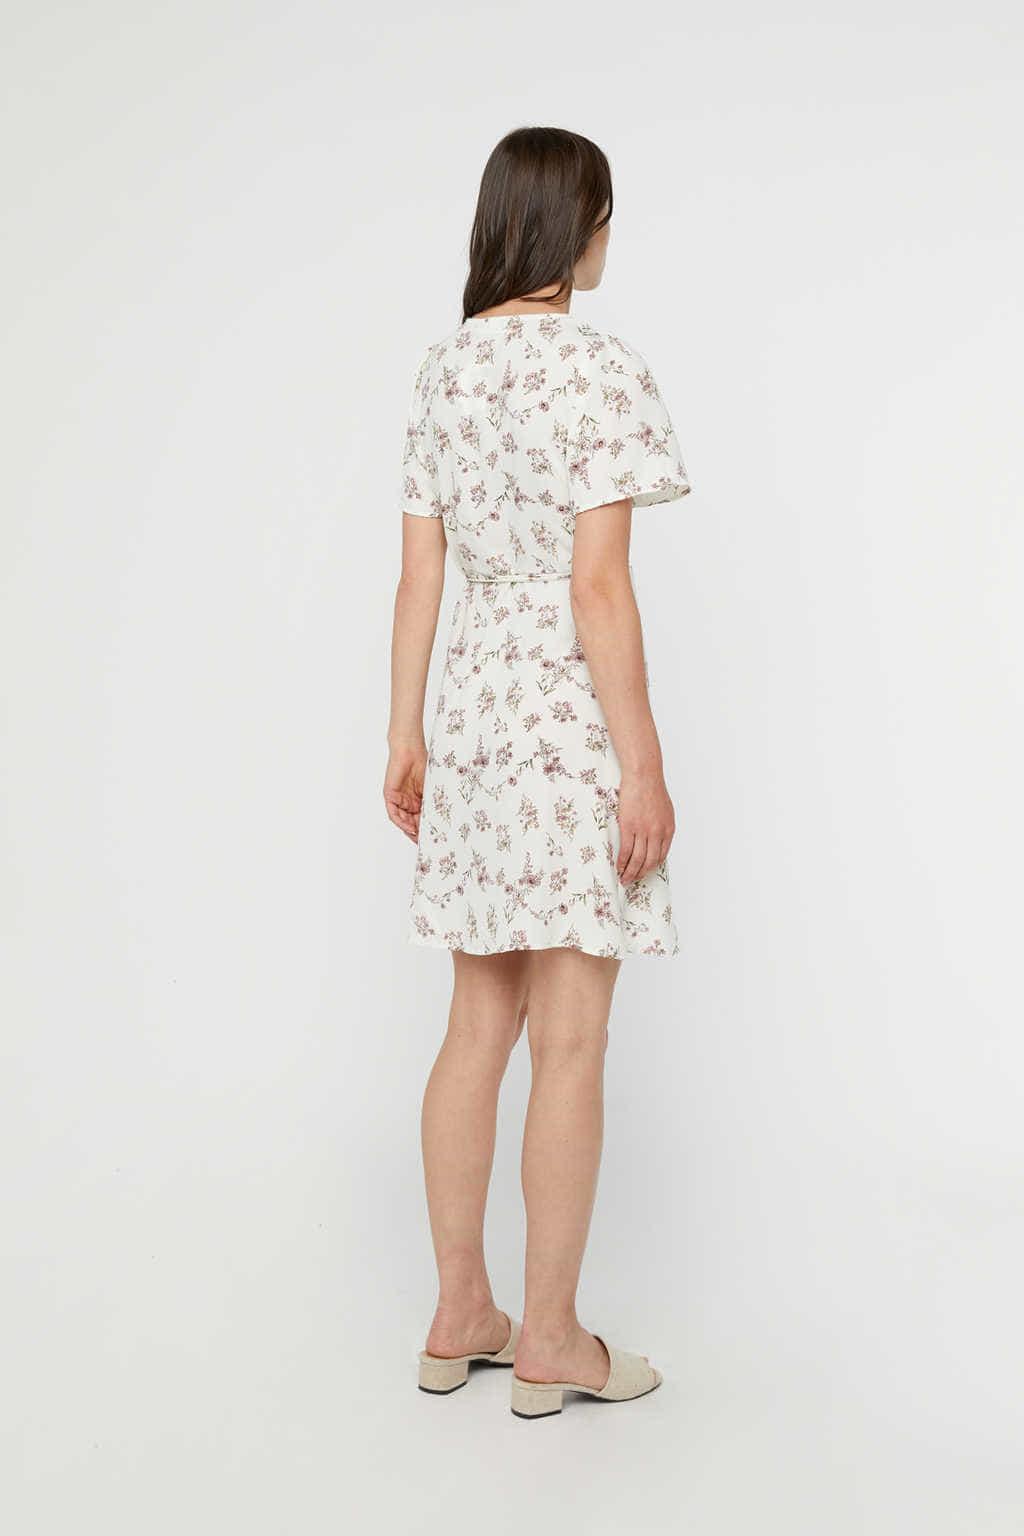 Dress K006 Cream 4